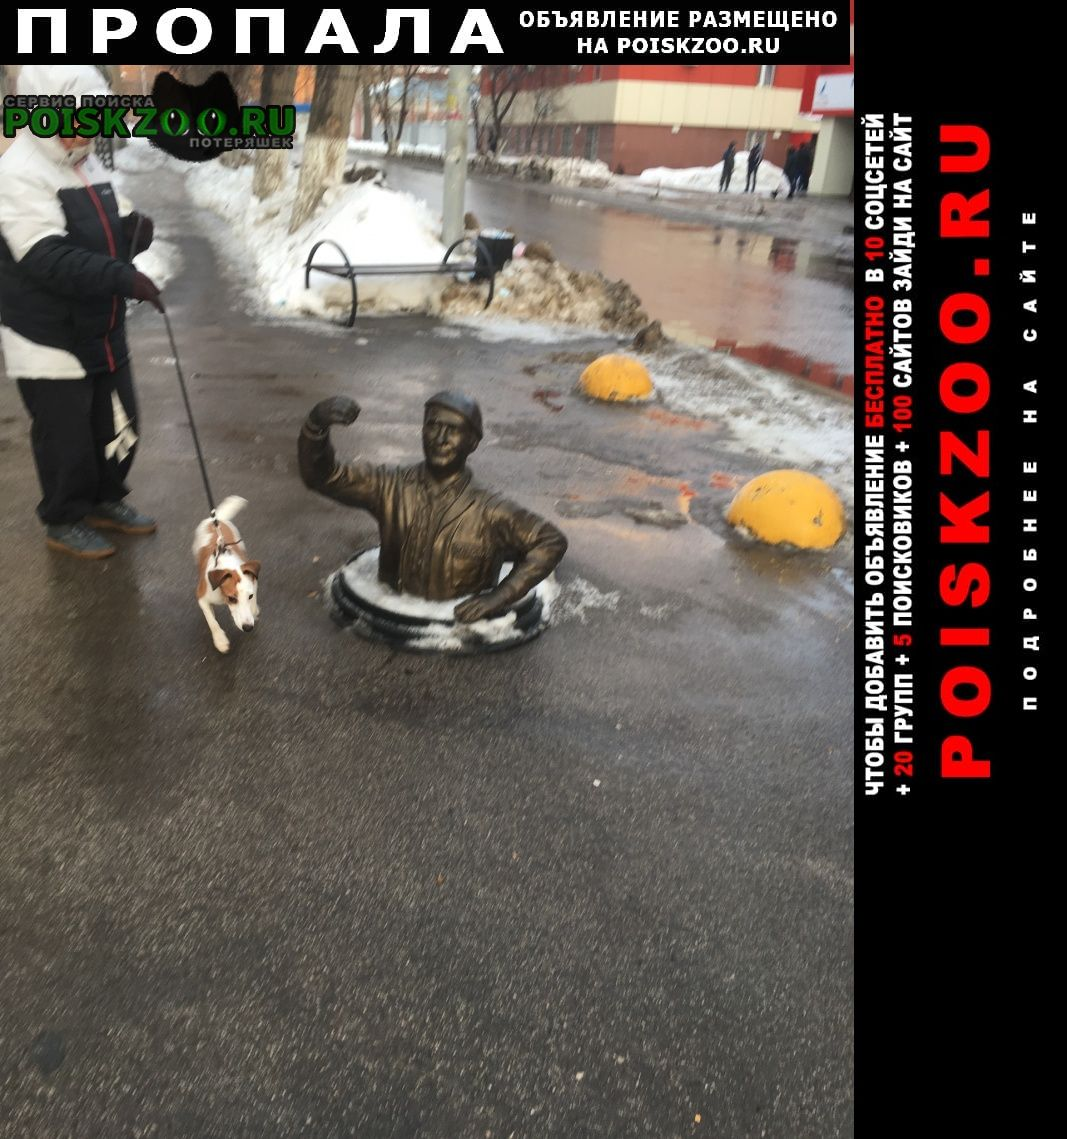 Пропала собака Саратов